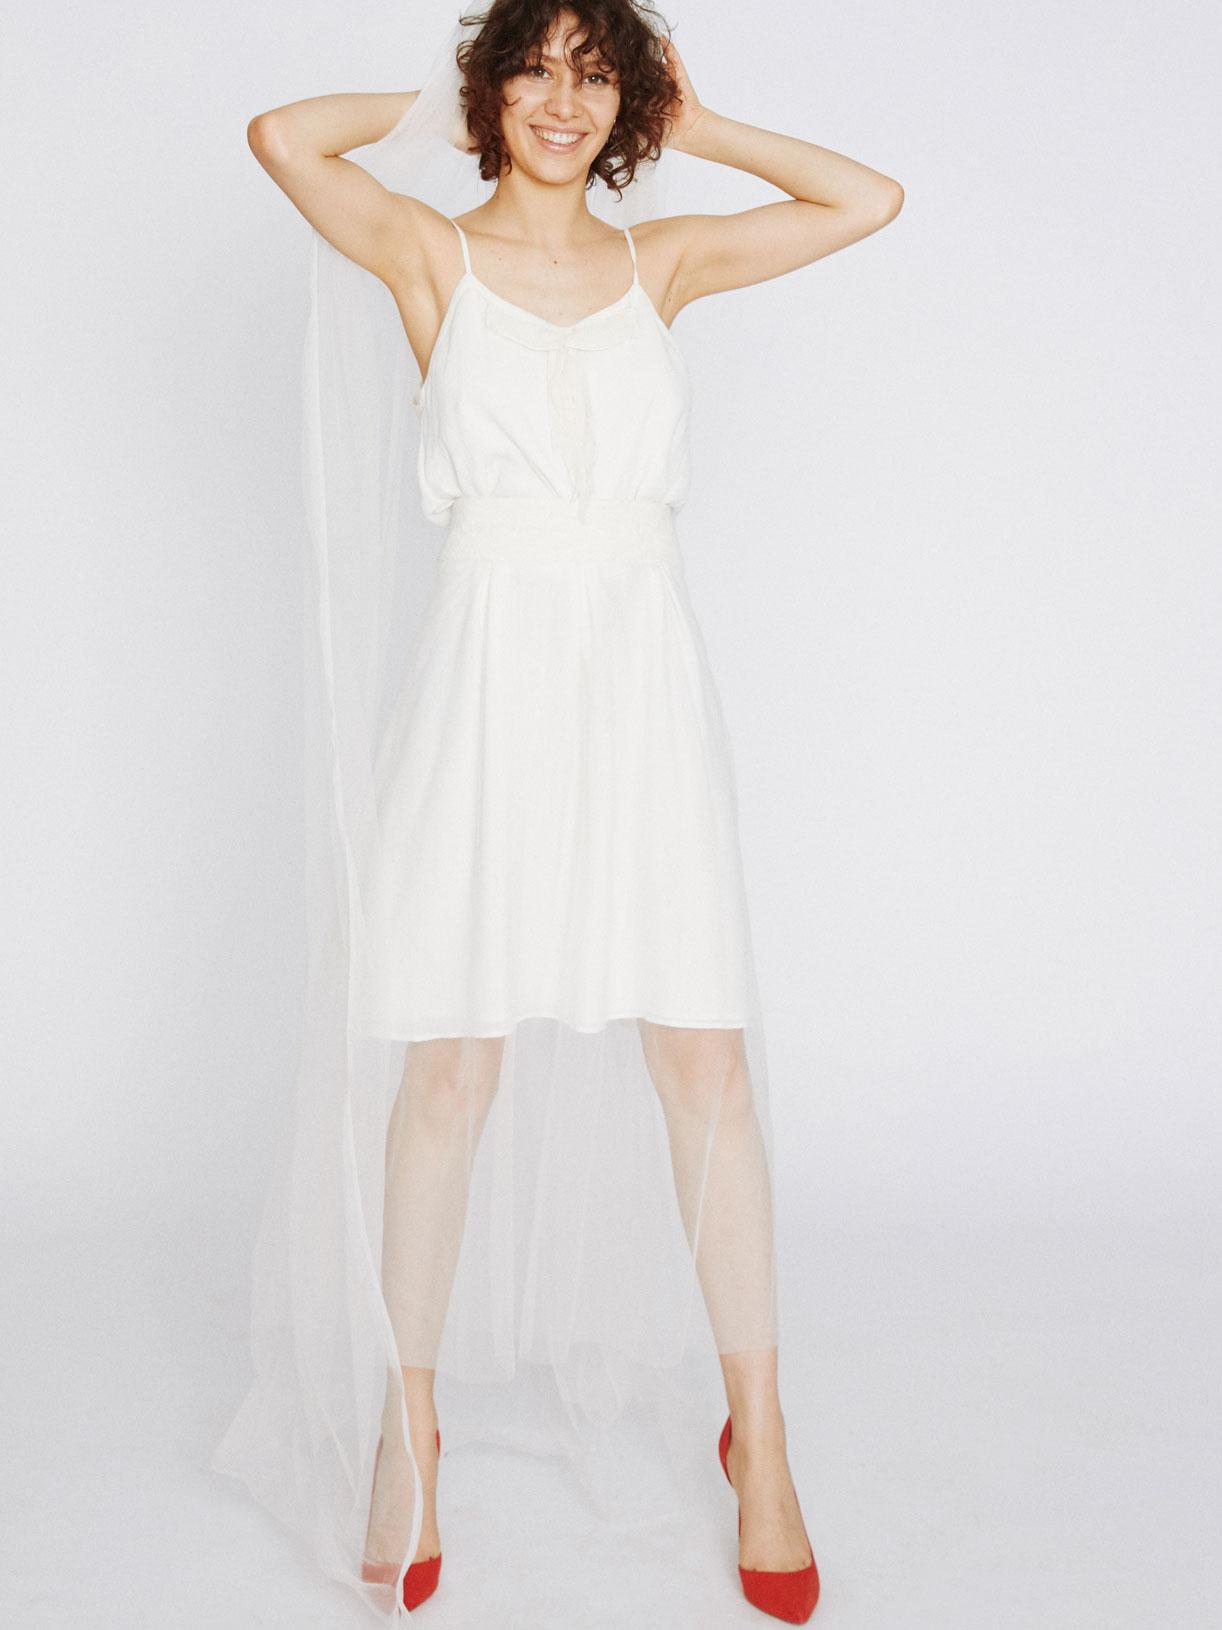 Hortense - Jupe de mariée